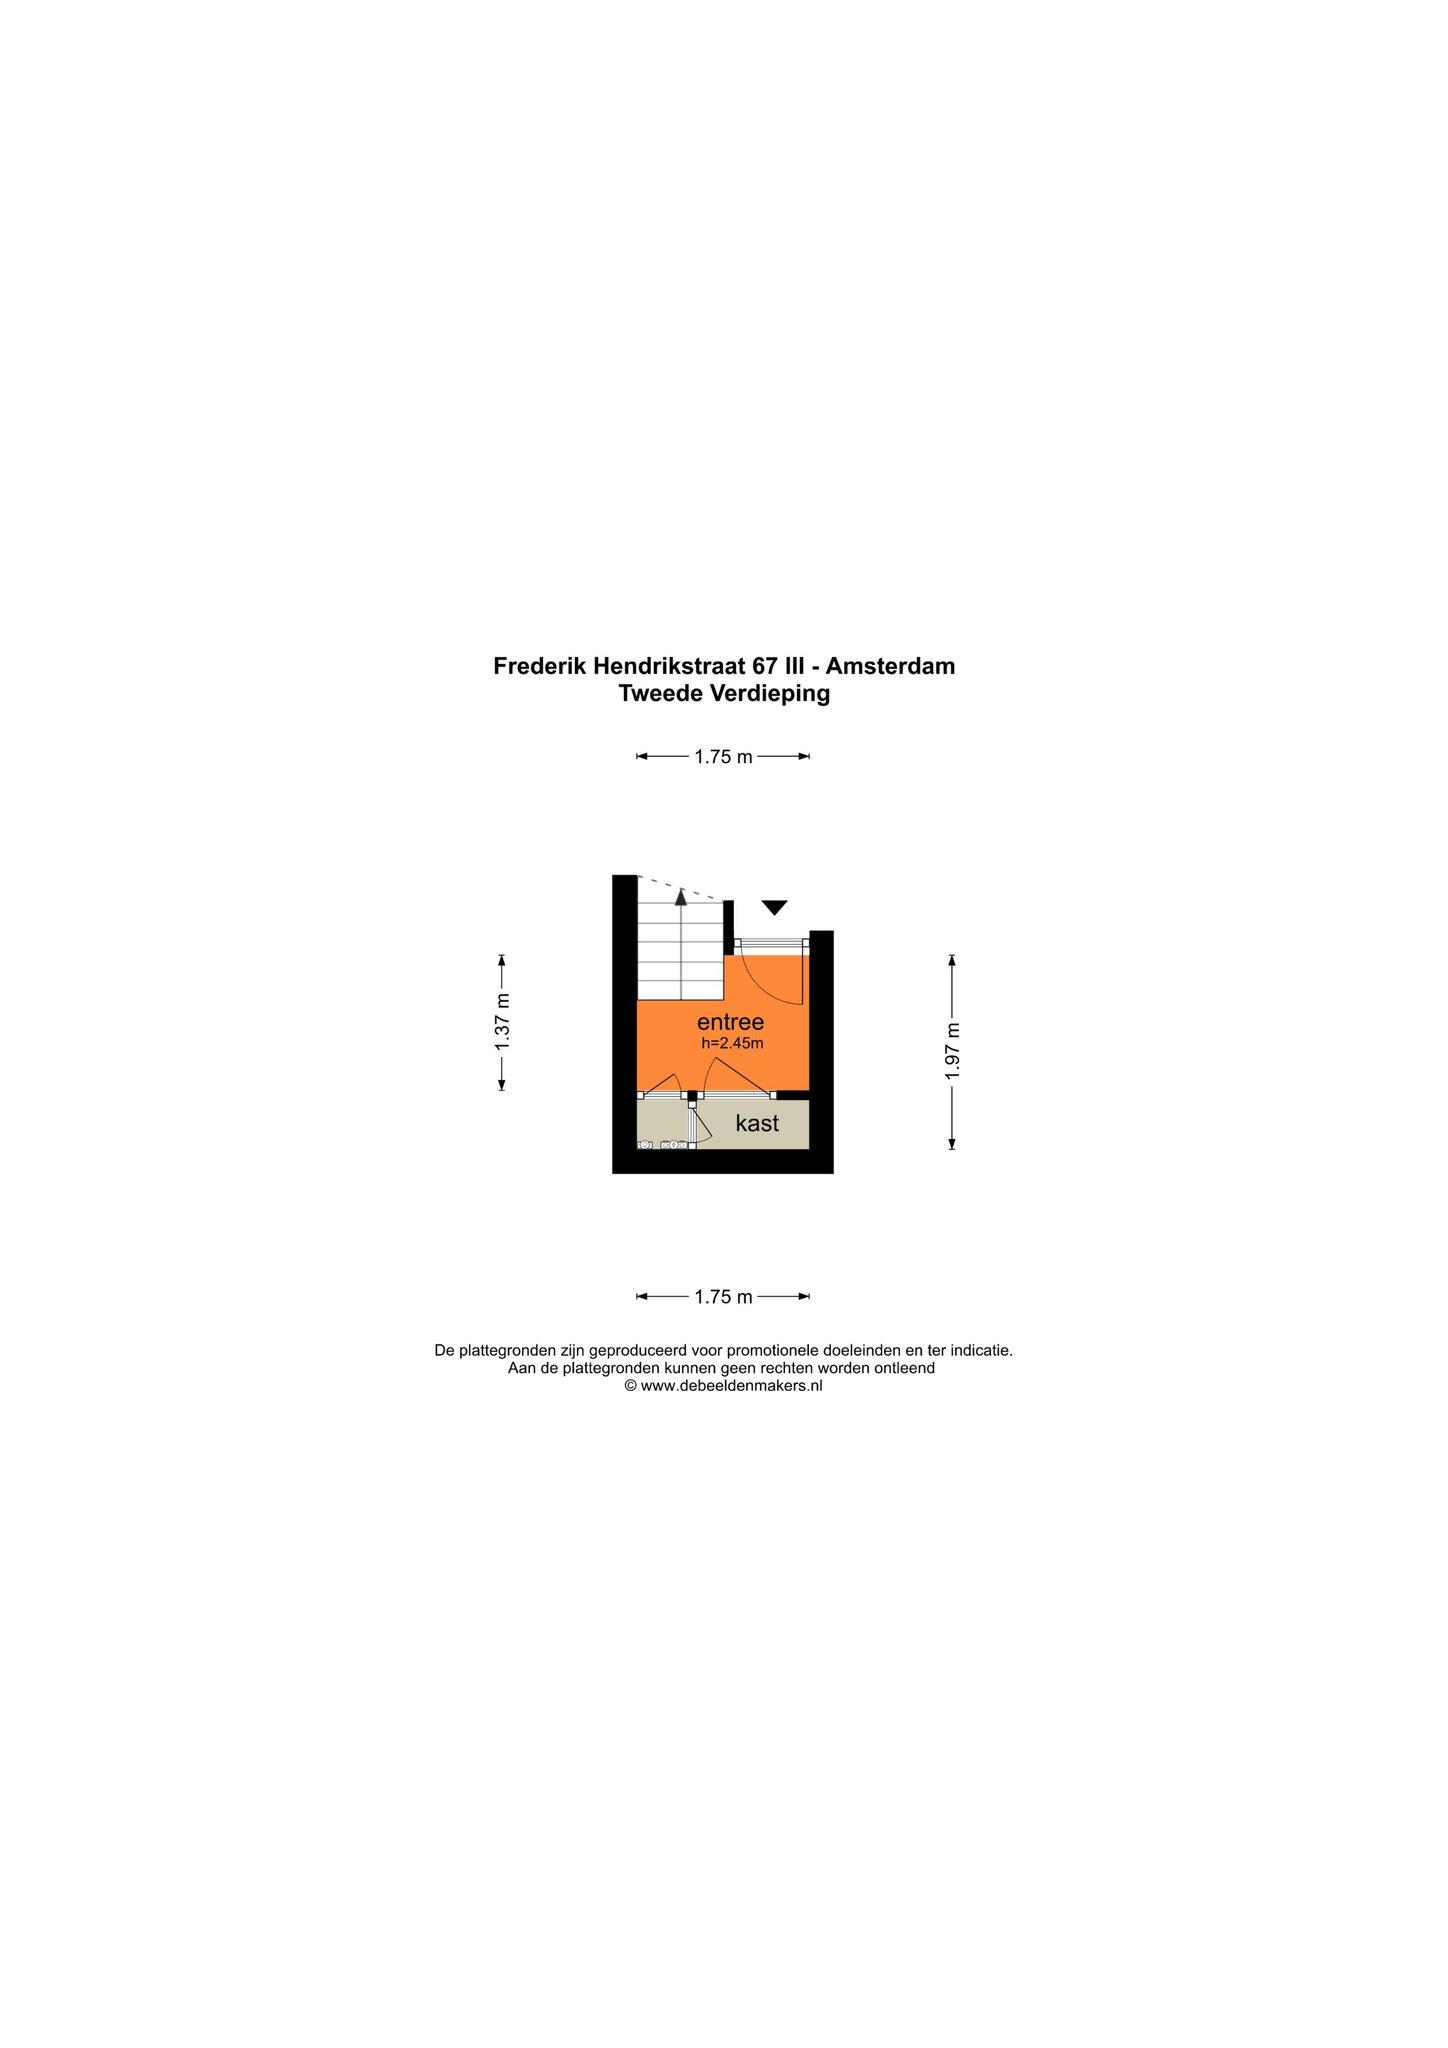 Amsterdam – Frederik Hendrikstraat 67III – Plattegrond 3